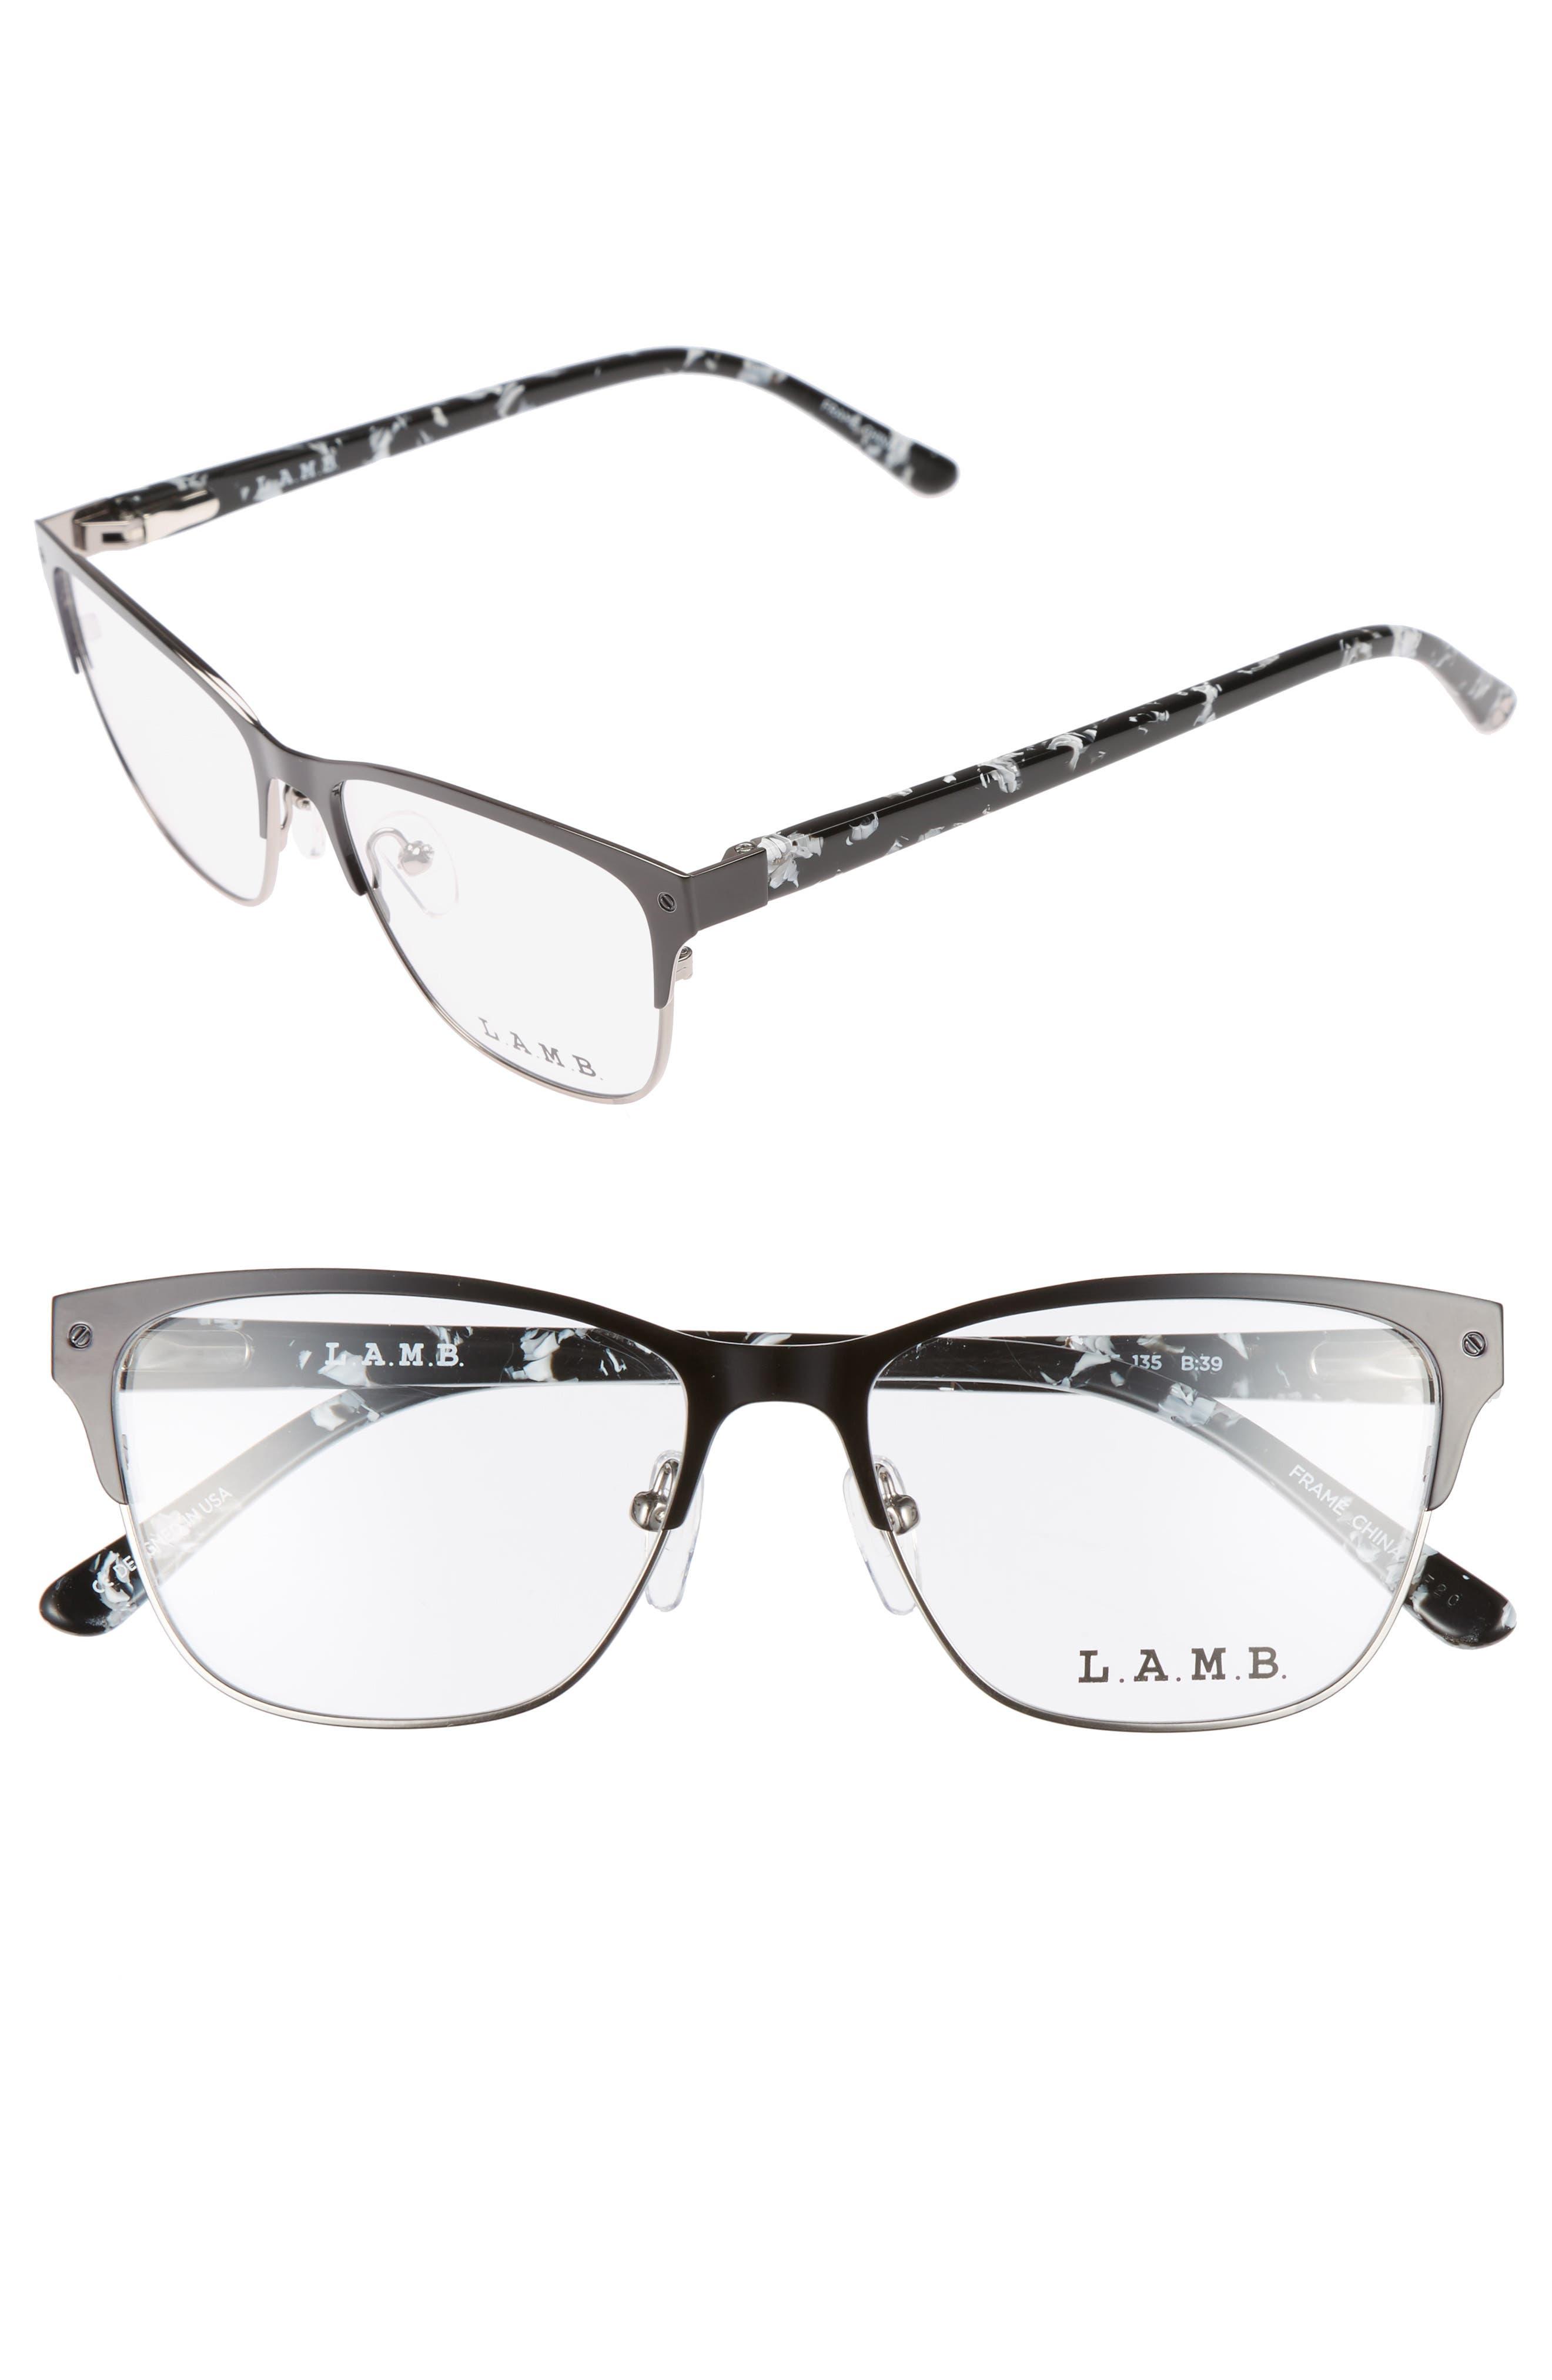 52mm Cat Eye Optical Glasses,                             Main thumbnail 1, color,                             Black